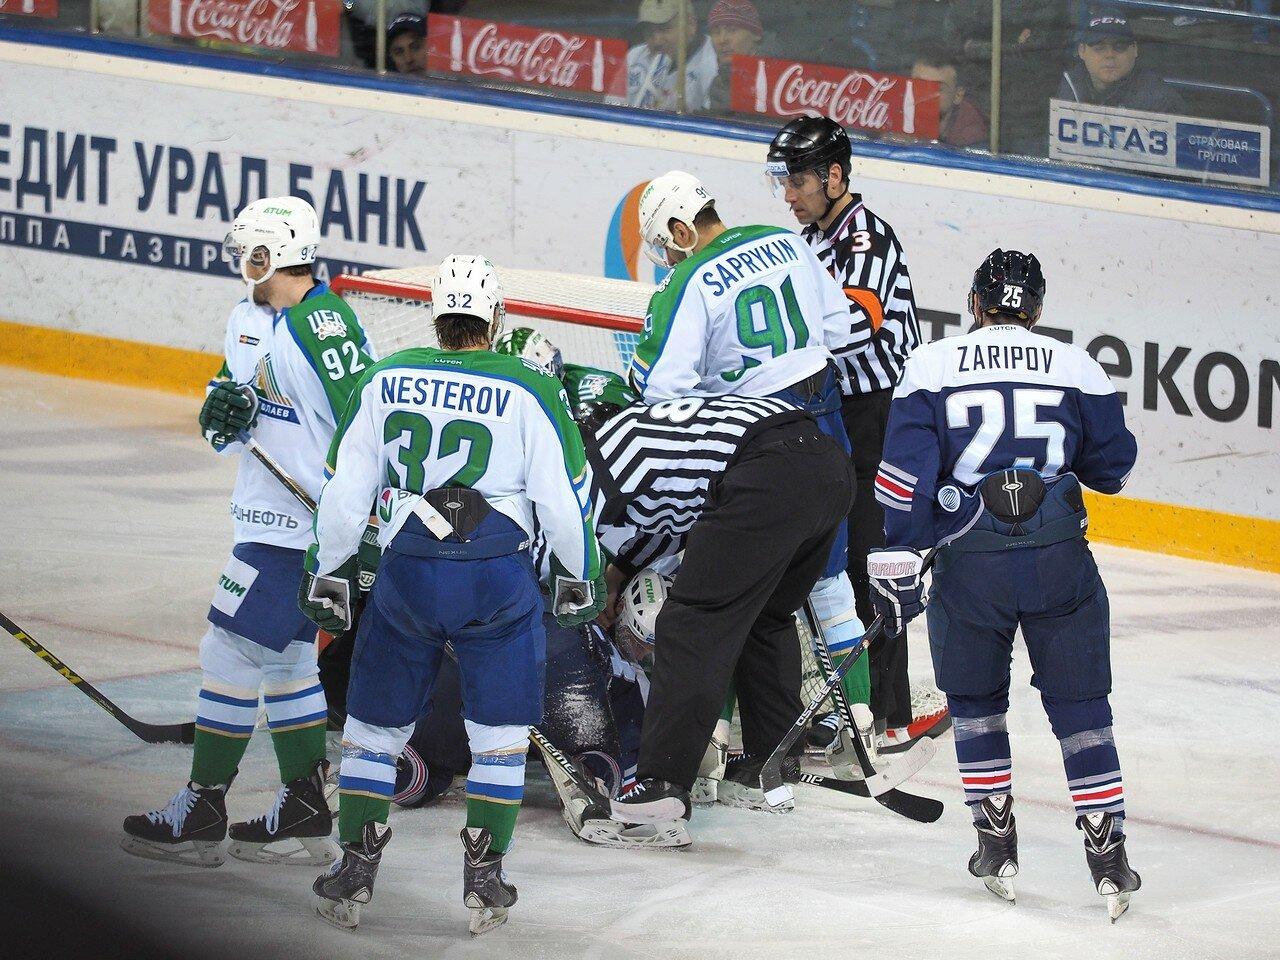 16Плей-офф 2016 Восток Финал Металлург - Салават Юлаев 25.03.2016